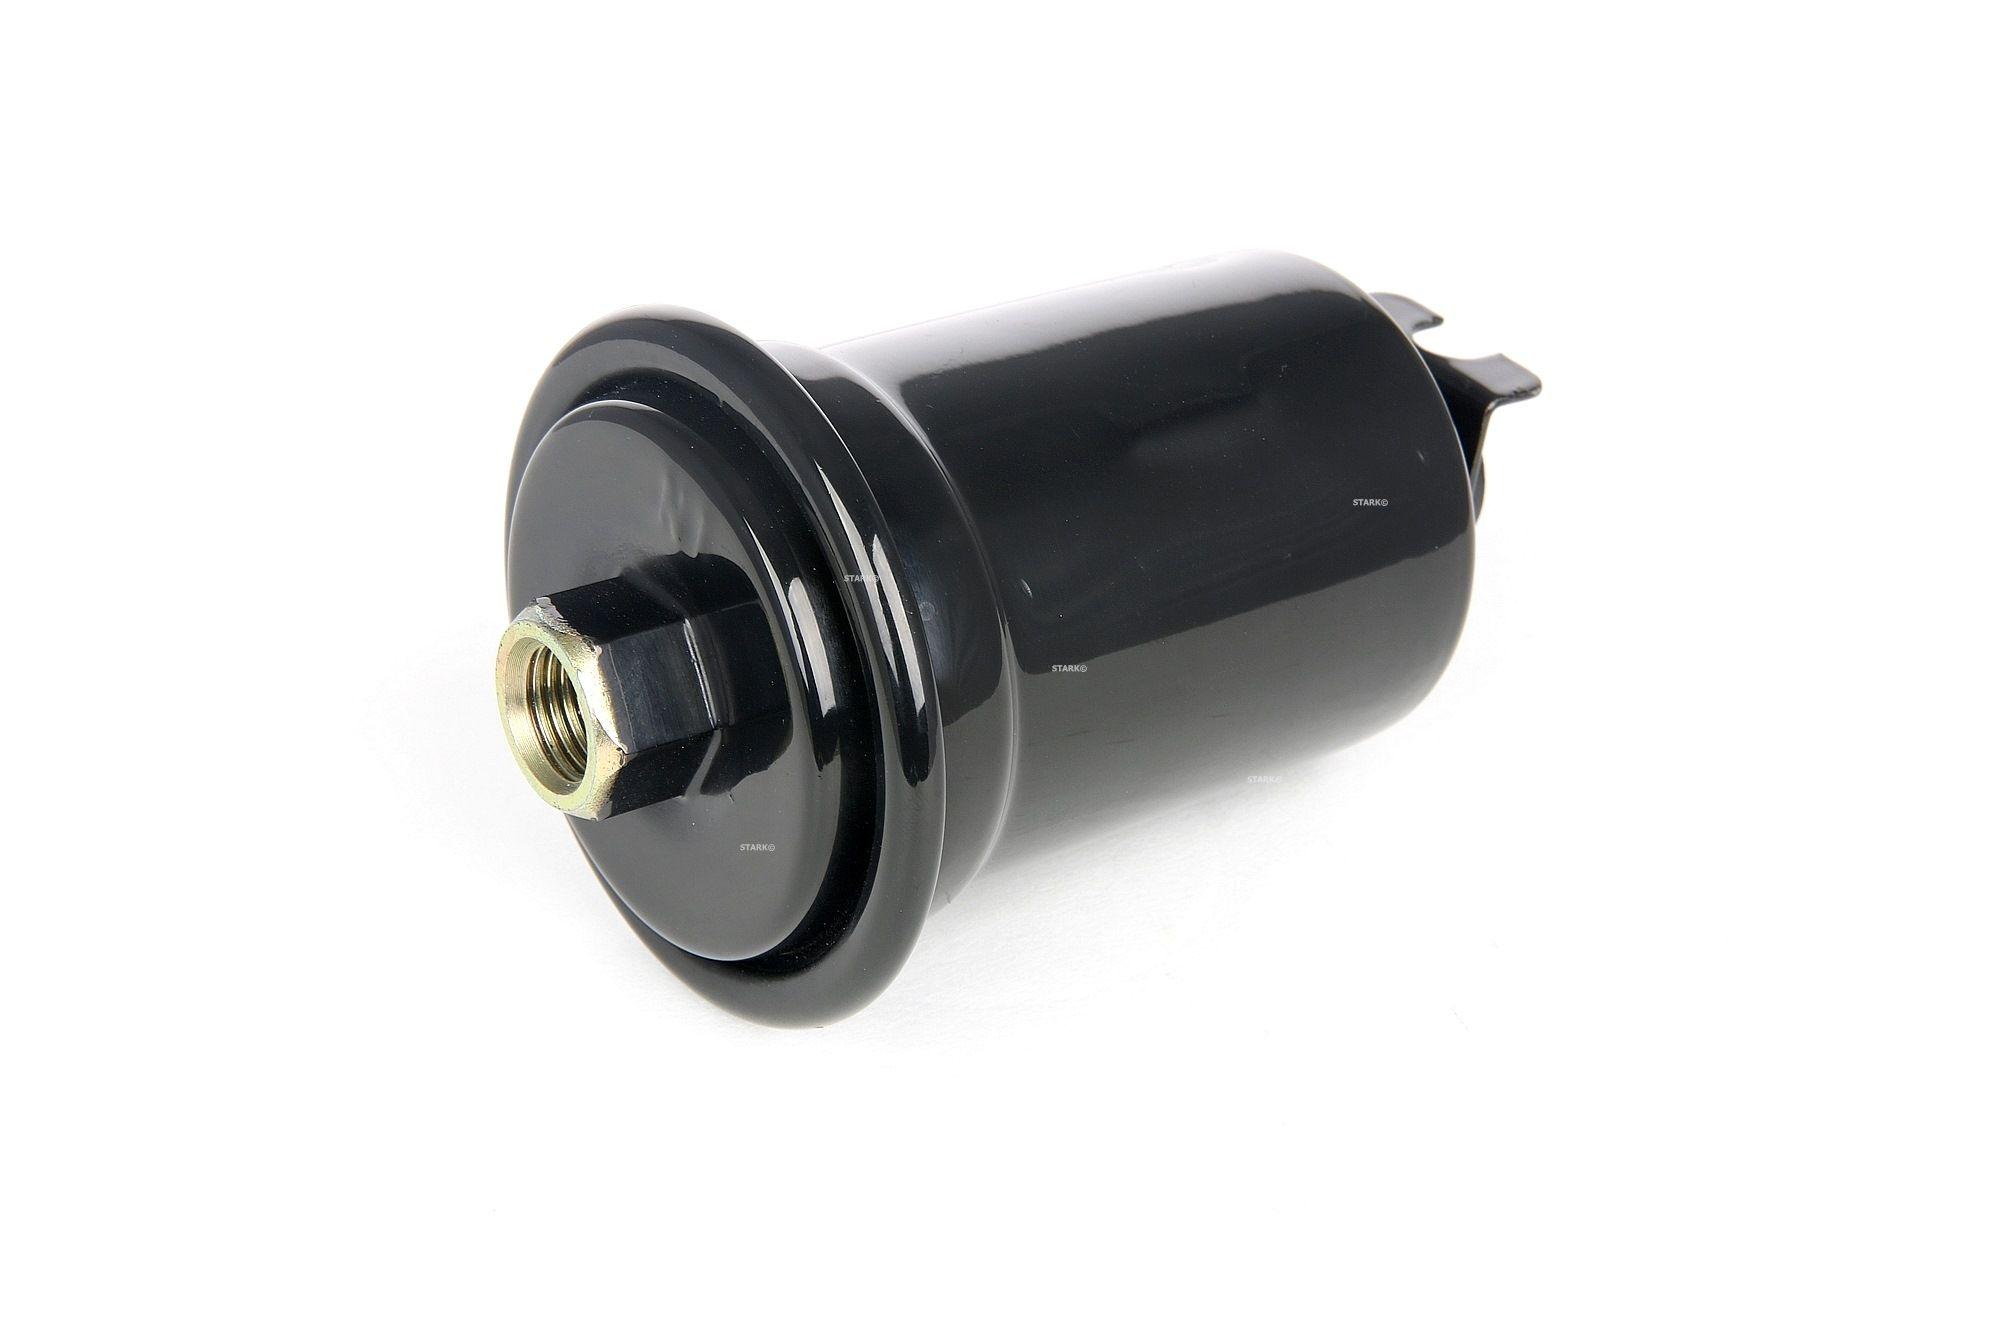 CHRYSLER Filtre à carburant d'Origine SKFF-0870098